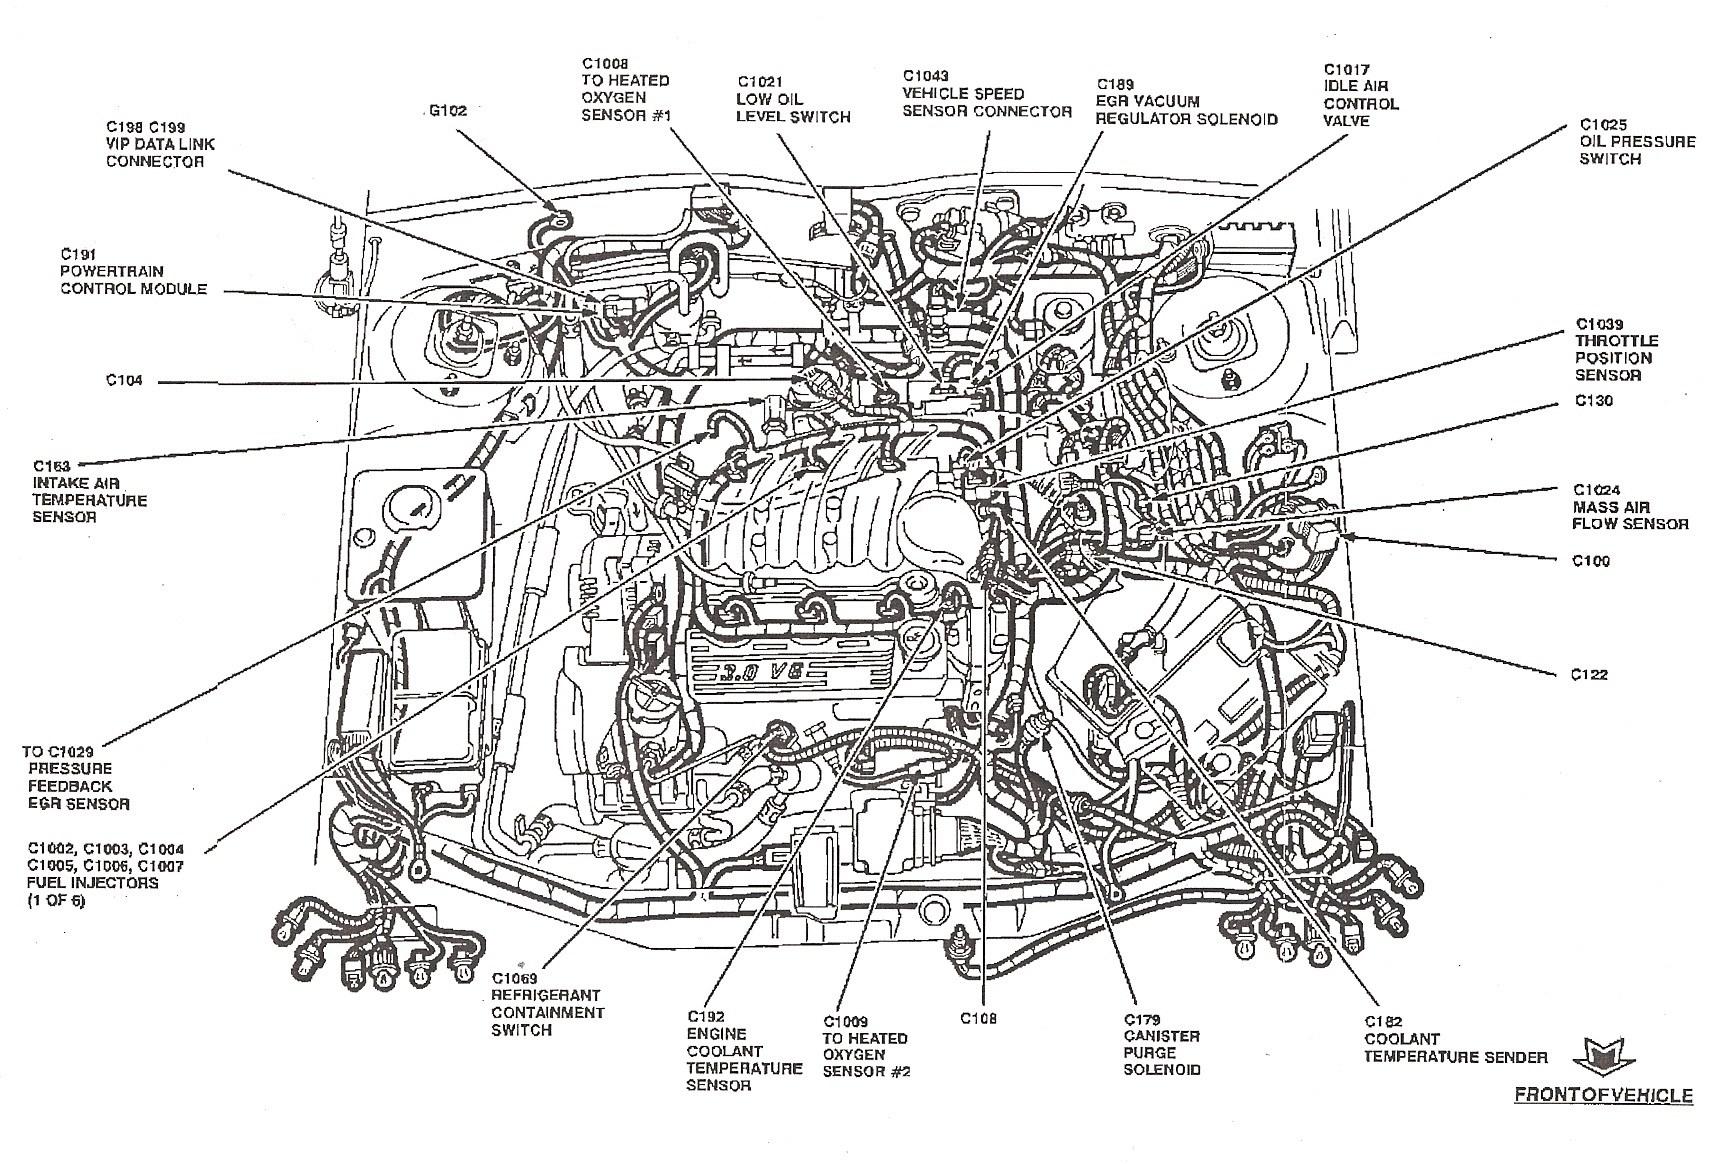 YG_2416] 2001 Ford Taurus Parts Diagram Wiring DiagramVulg Cular Sulf Caba Opein Mohammedshrine Librar Wiring 101